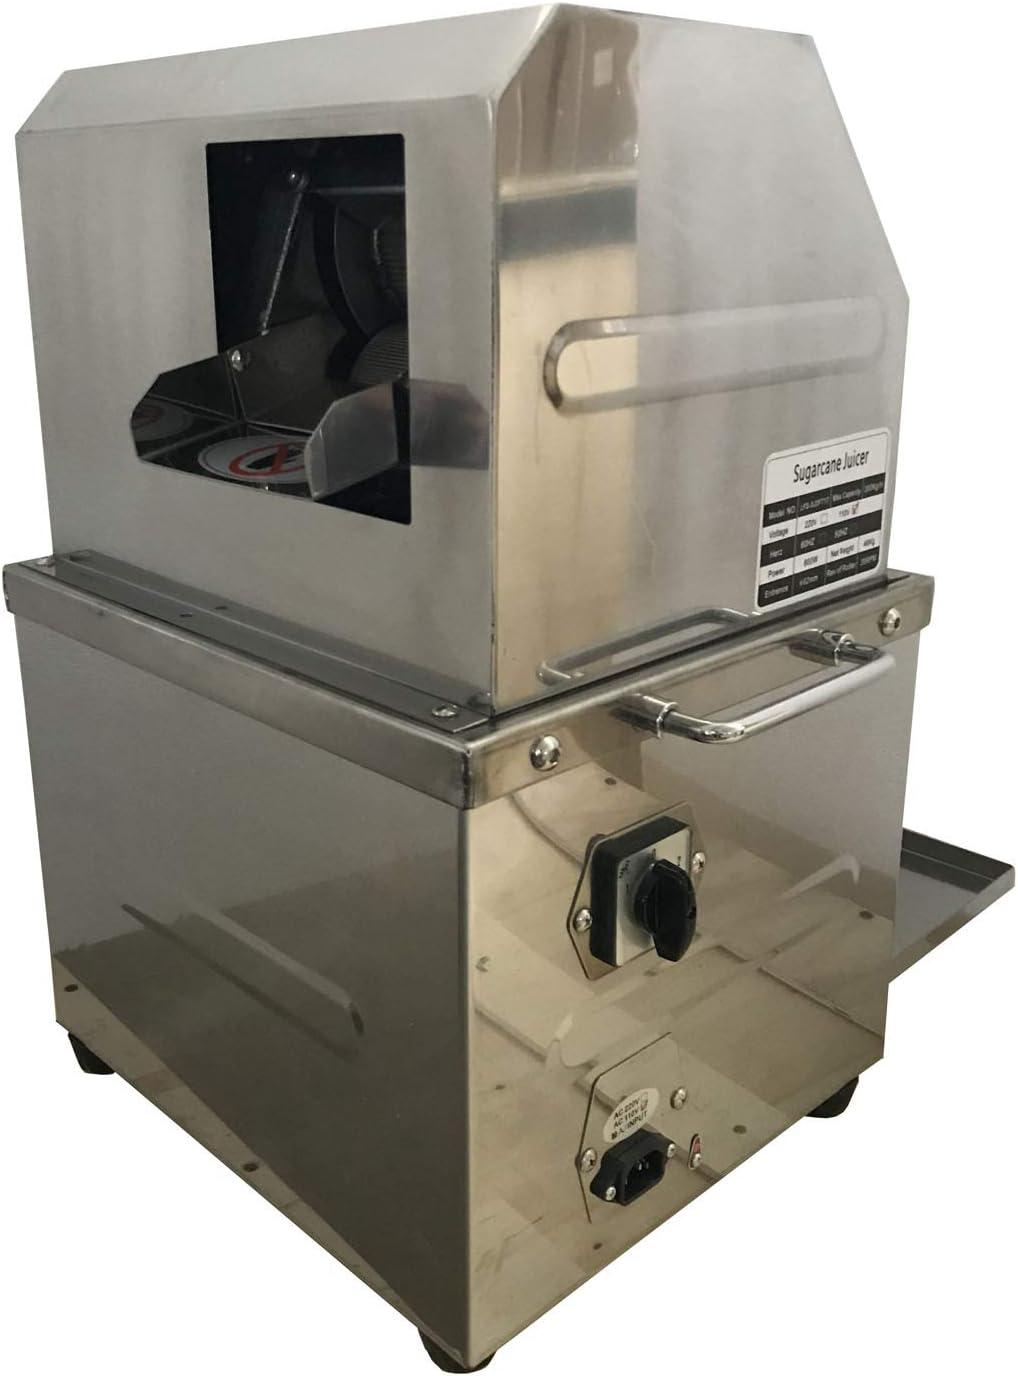 INTBUYING 110v Desktop Electric Sugar Cane Ginger Sweet Sorghum Masticating Juicer Press Juicer with 304 Stainless Steel Rollers